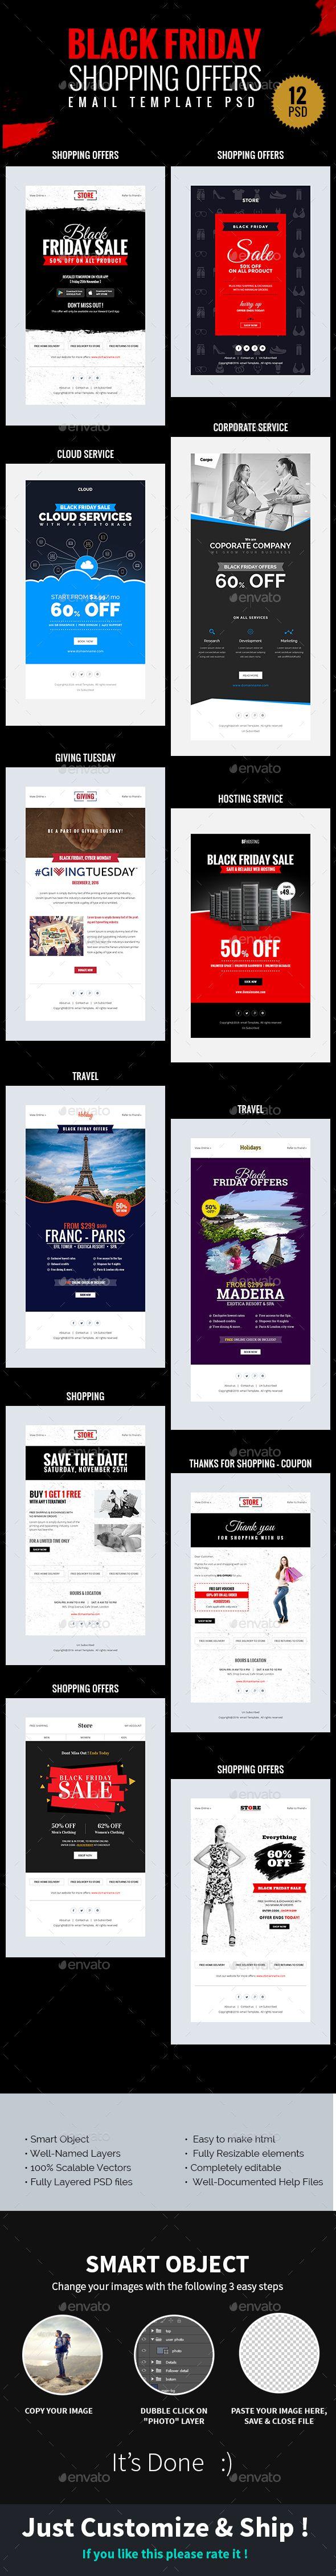 best 25 email template design ideas on pinterest email newsletter design email templates and. Black Bedroom Furniture Sets. Home Design Ideas